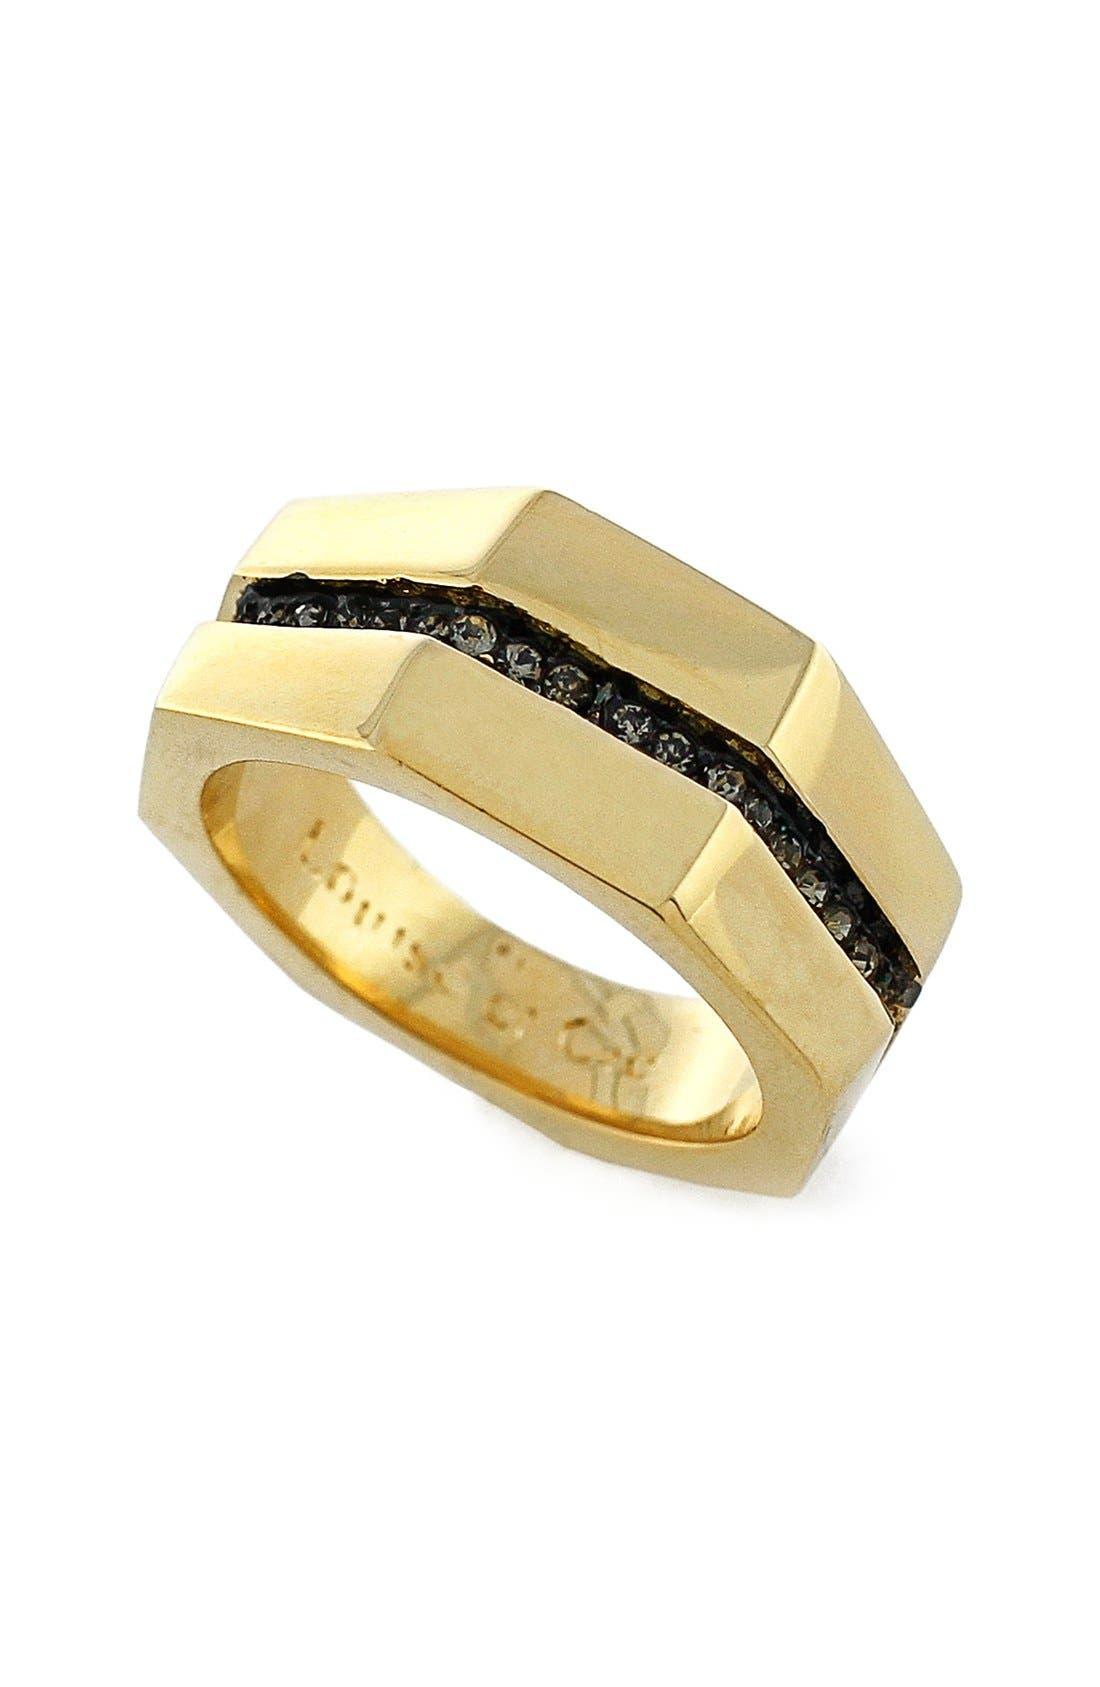 Main Image - Louise et Cie'Kammenstrat'Split PavéBand Ring